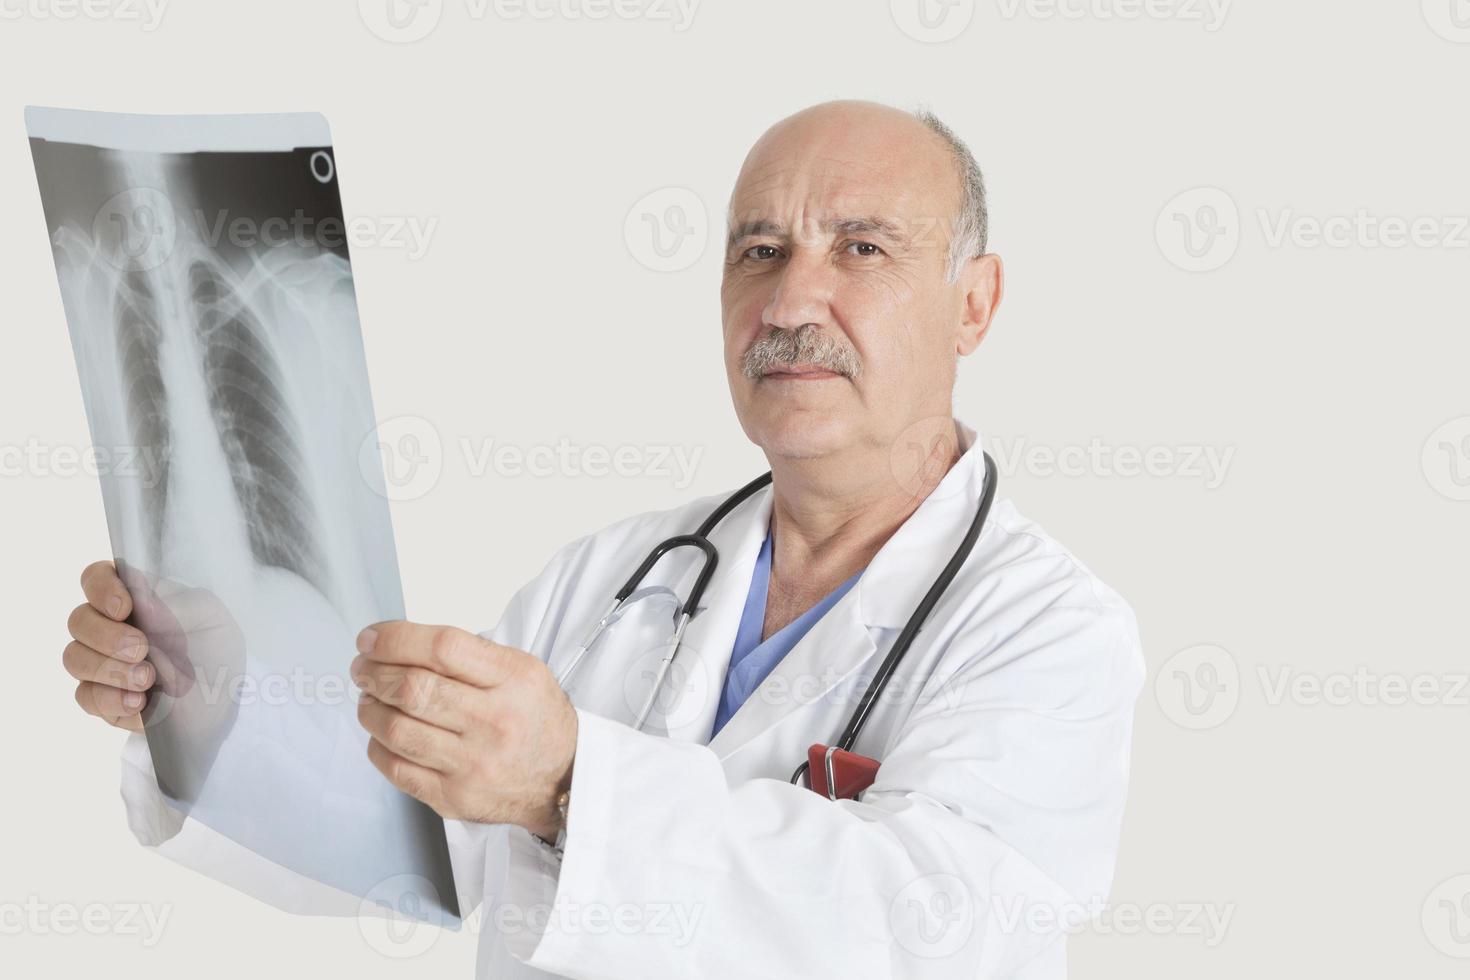 felice medico senior foto